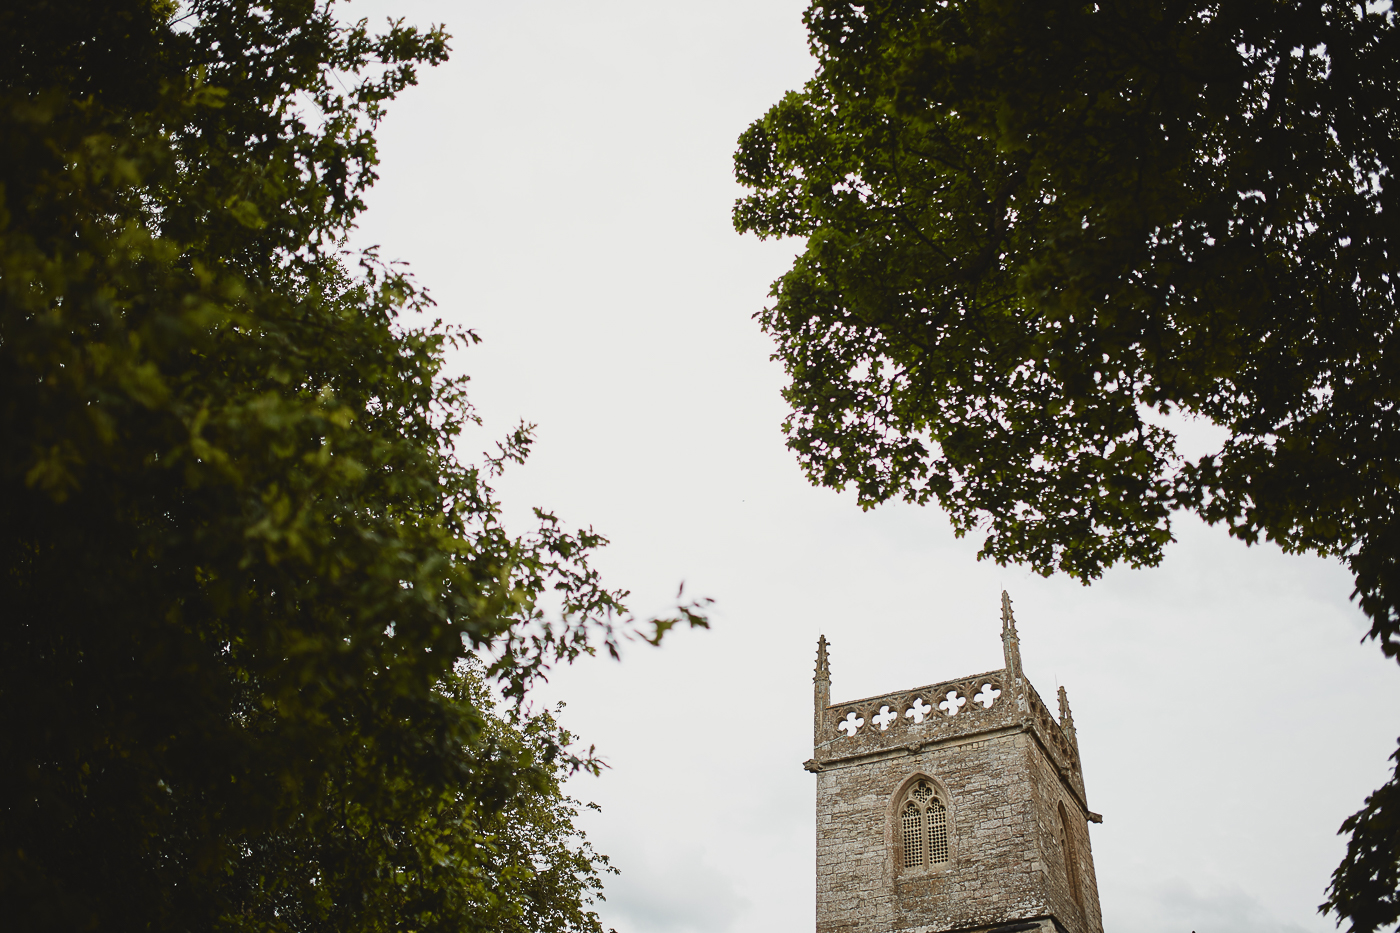 Danni_And_Jack_Gloucester_Wedding-49.jpg